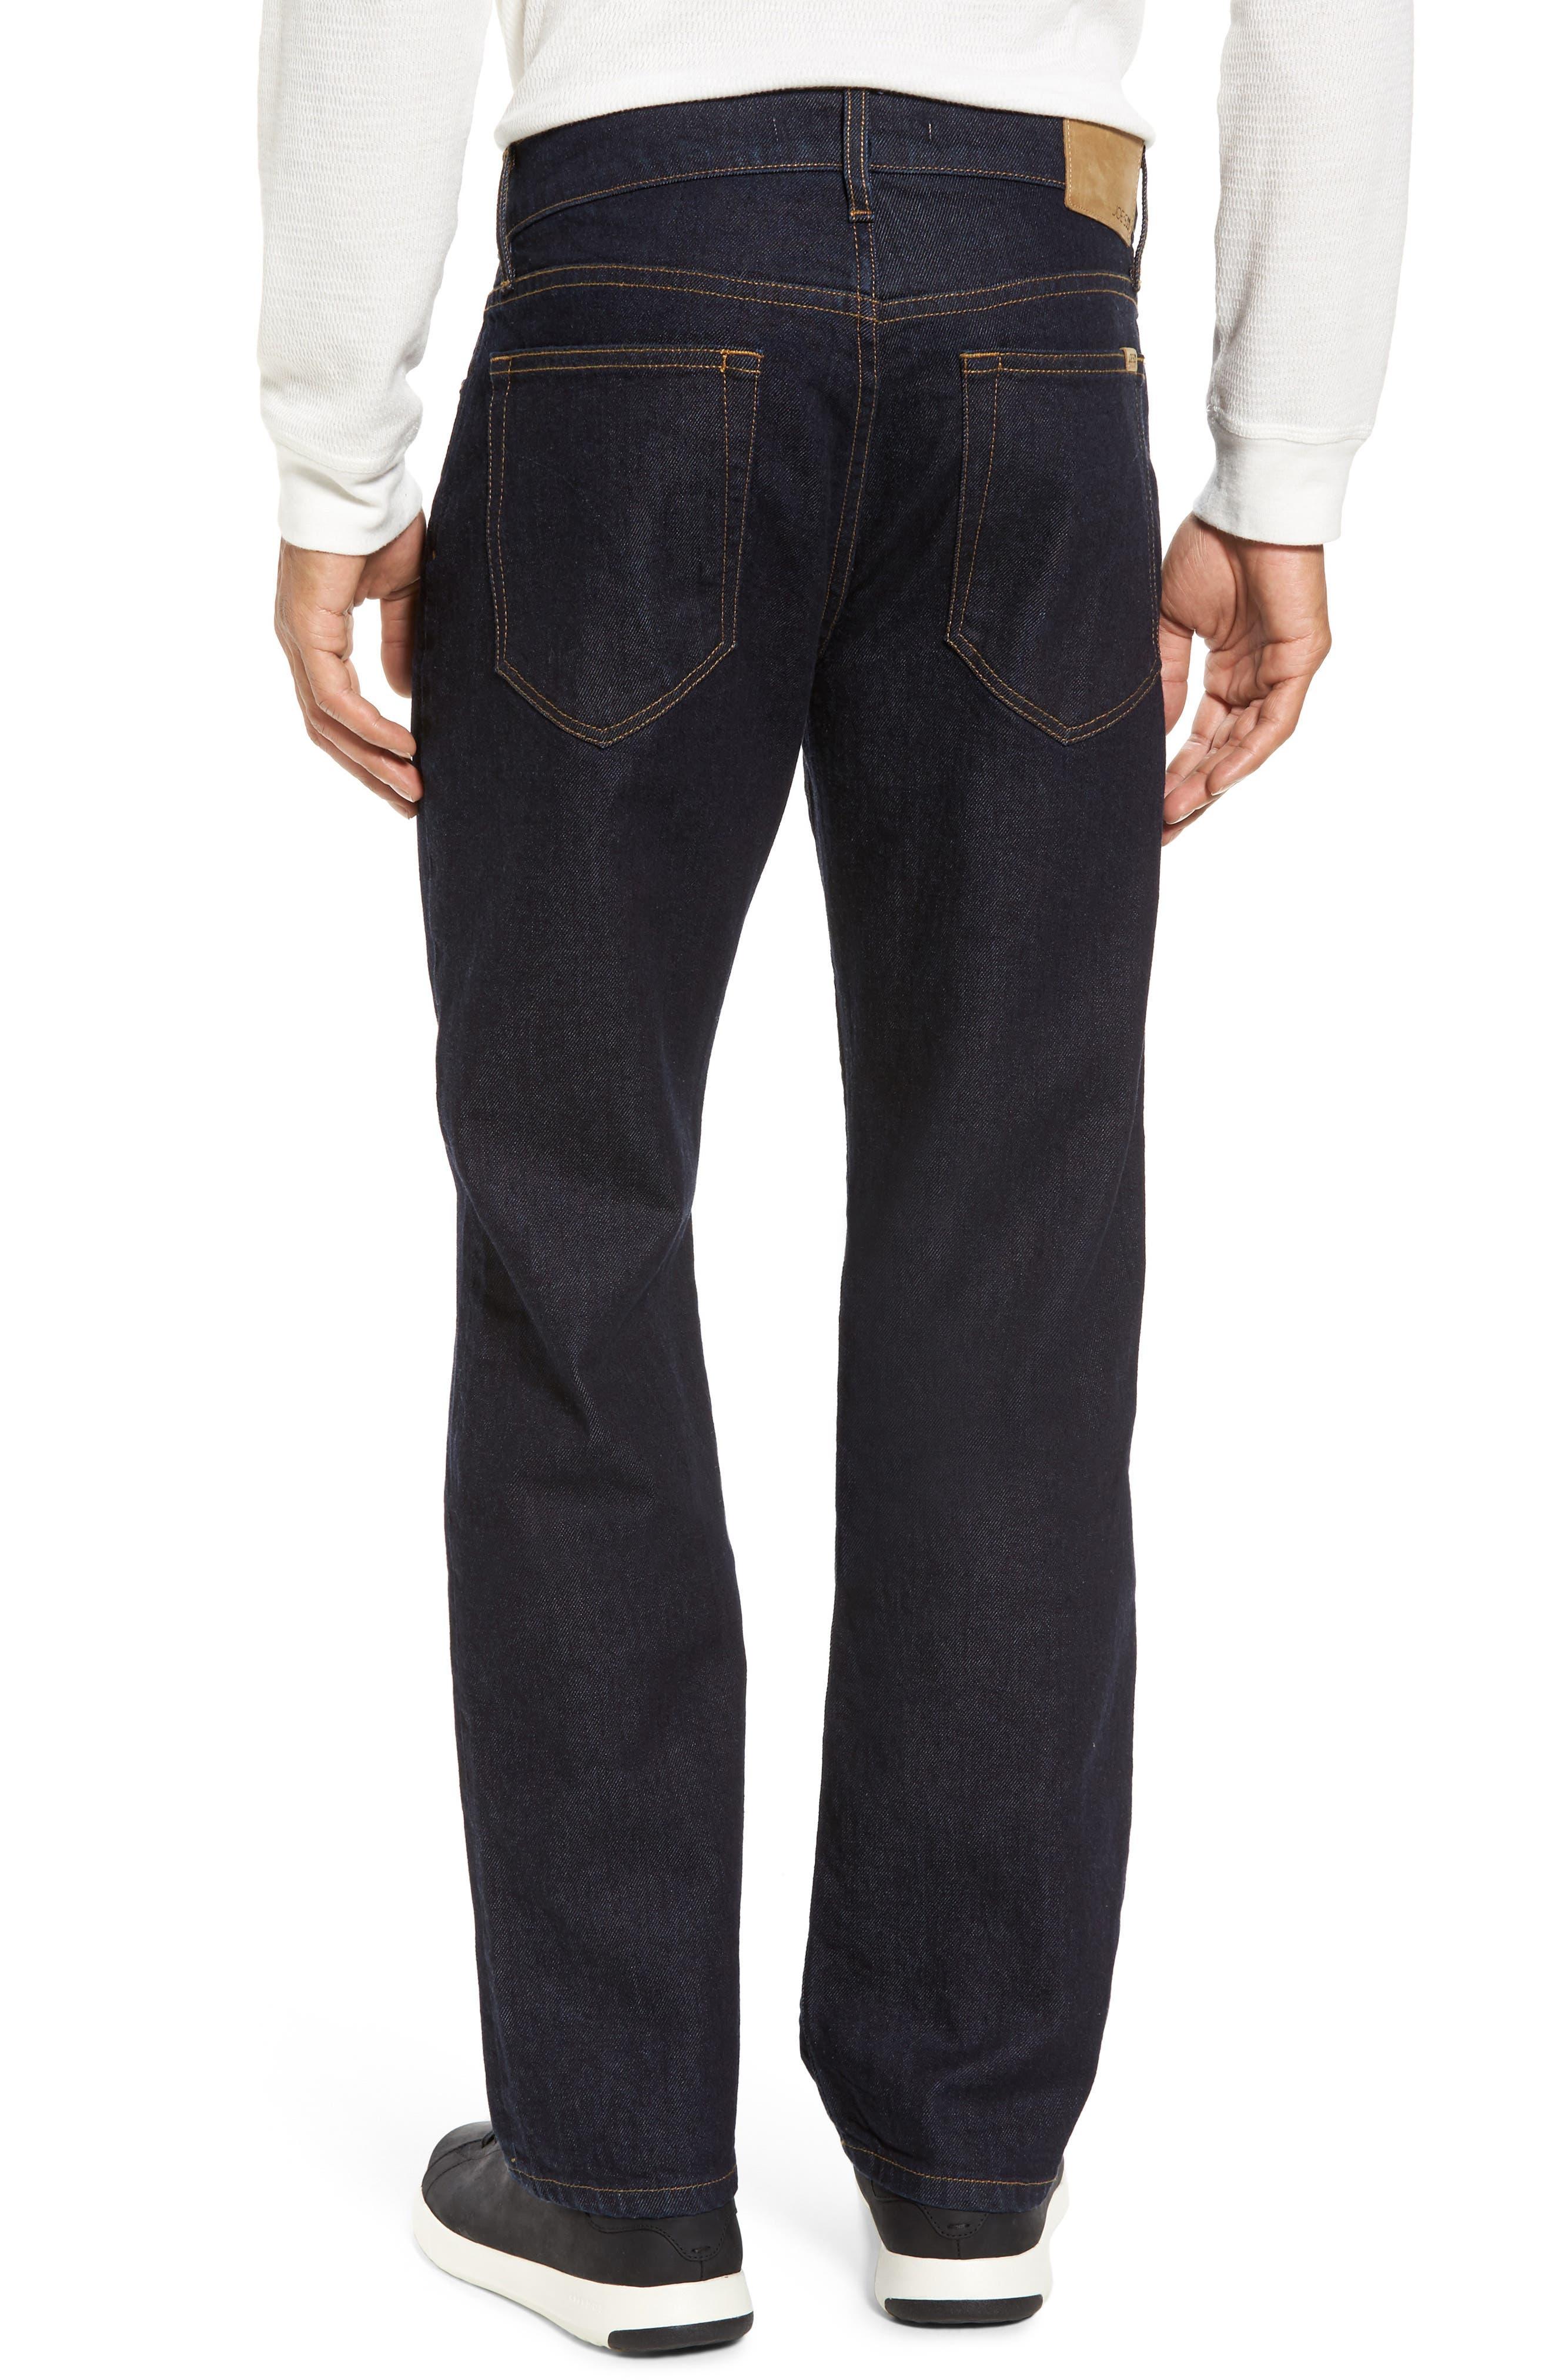 Brixton Slim Straight Leg Jeans,                             Alternate thumbnail 2, color,                             400